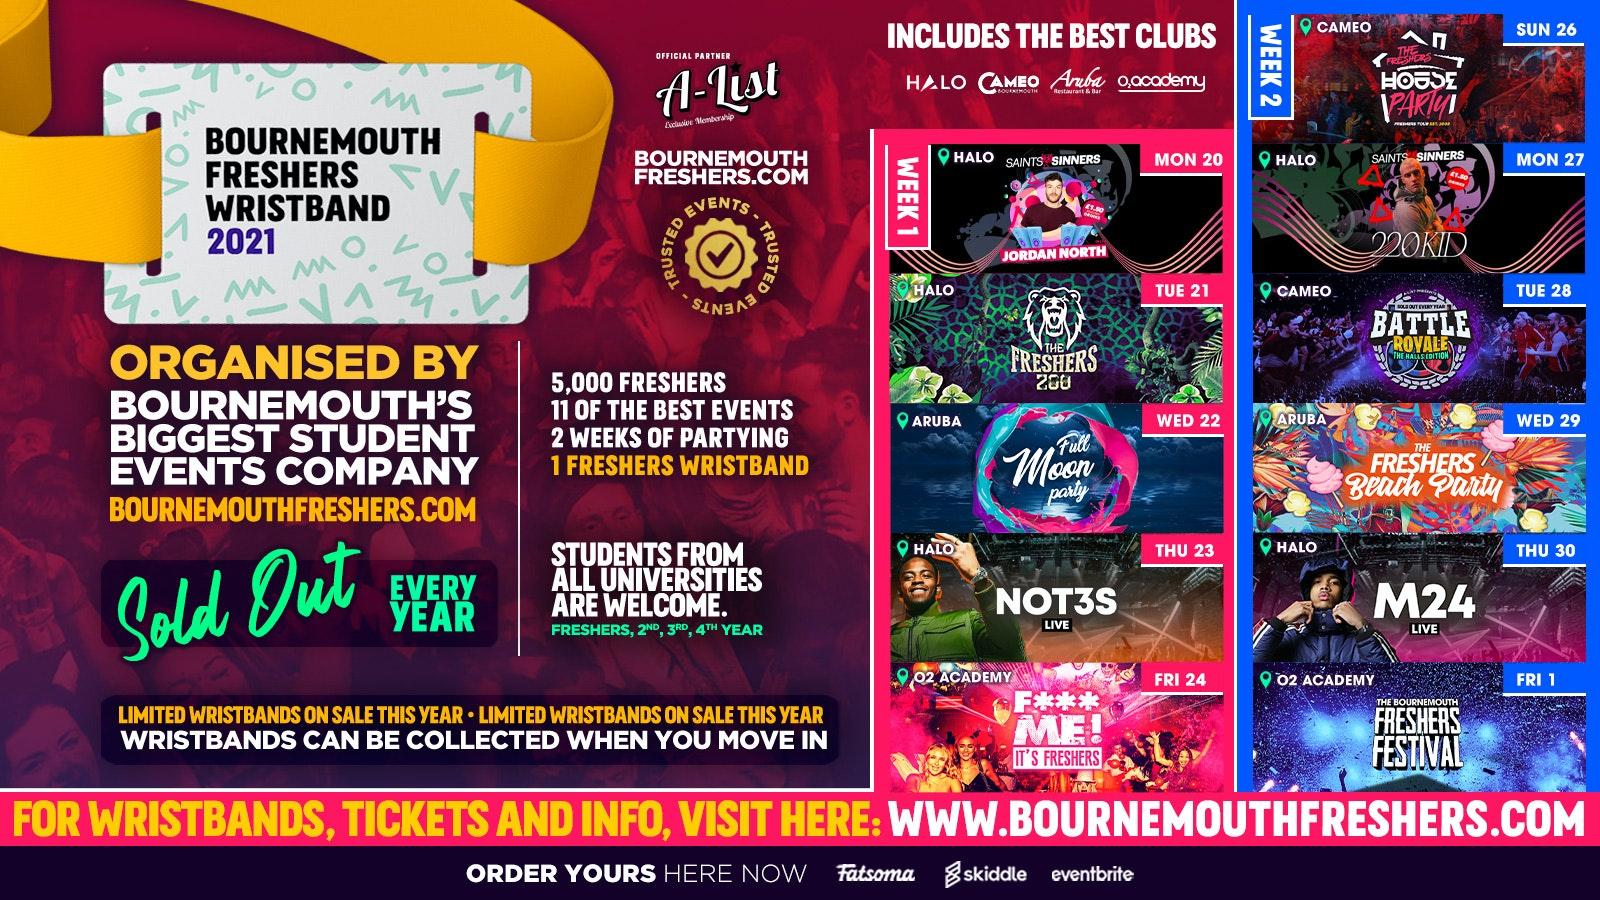 Bournemouth Freshers 2021 – www.bournemouthfreshers.com | Sign Up 2021